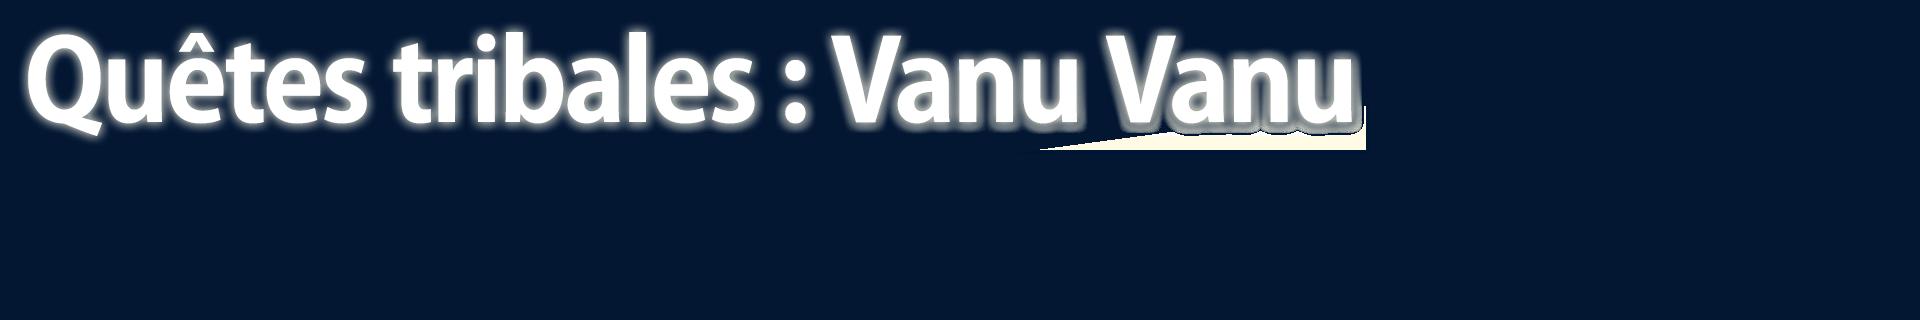 Quêtes tribales : Vanu Vanu